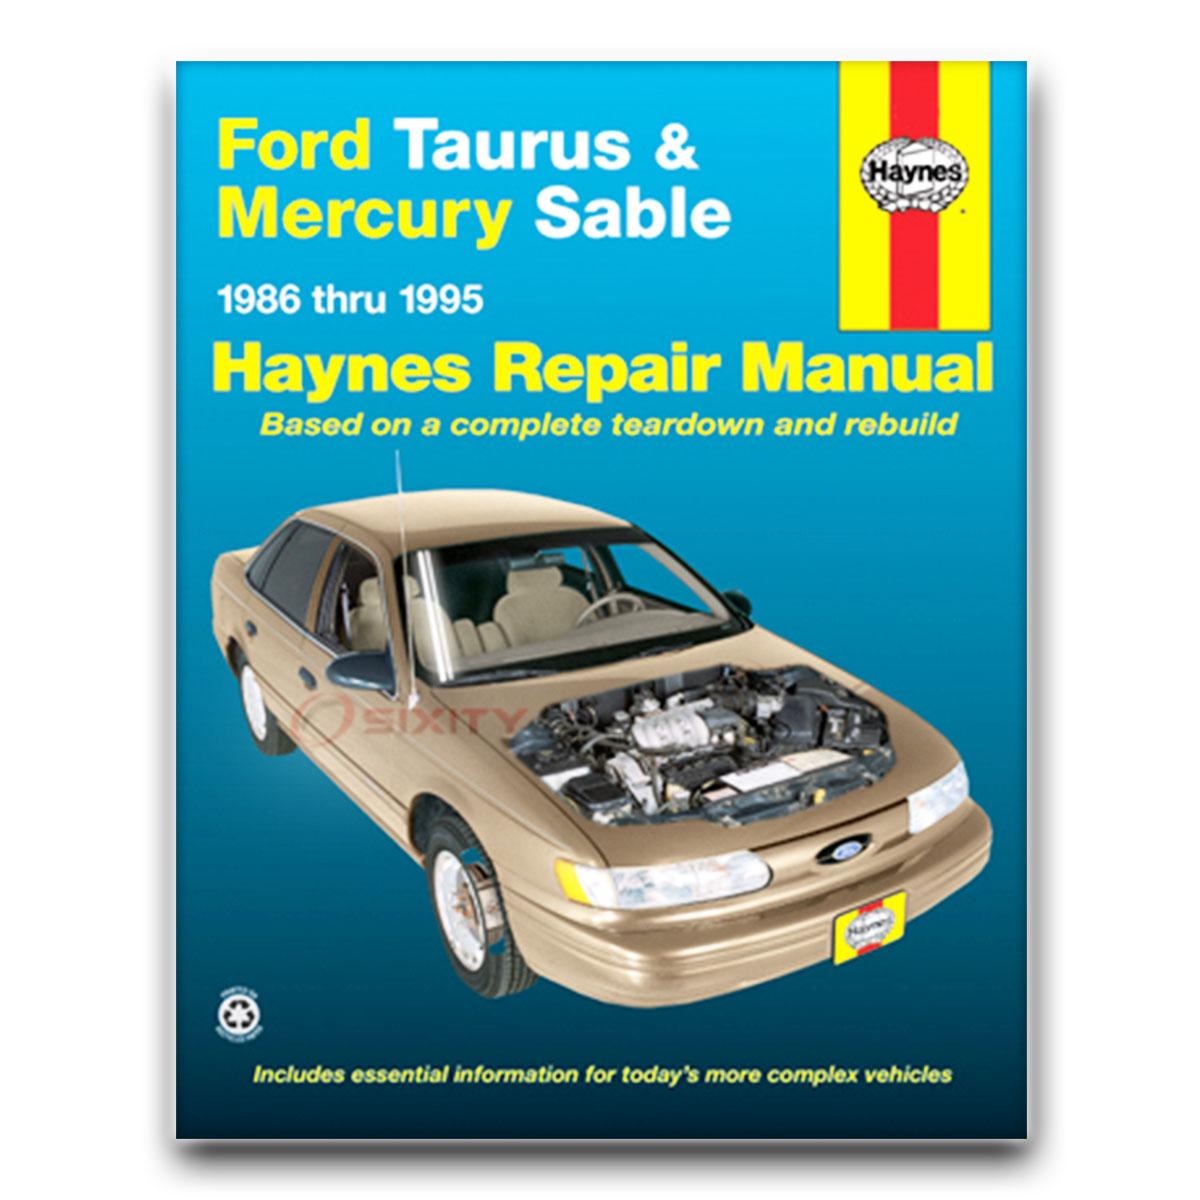 mercury sable haynes repair manual ls gs shop service garage book fm rh ebay com 1993 Ford Taurus Sho 2000 Ford Taurus Sho